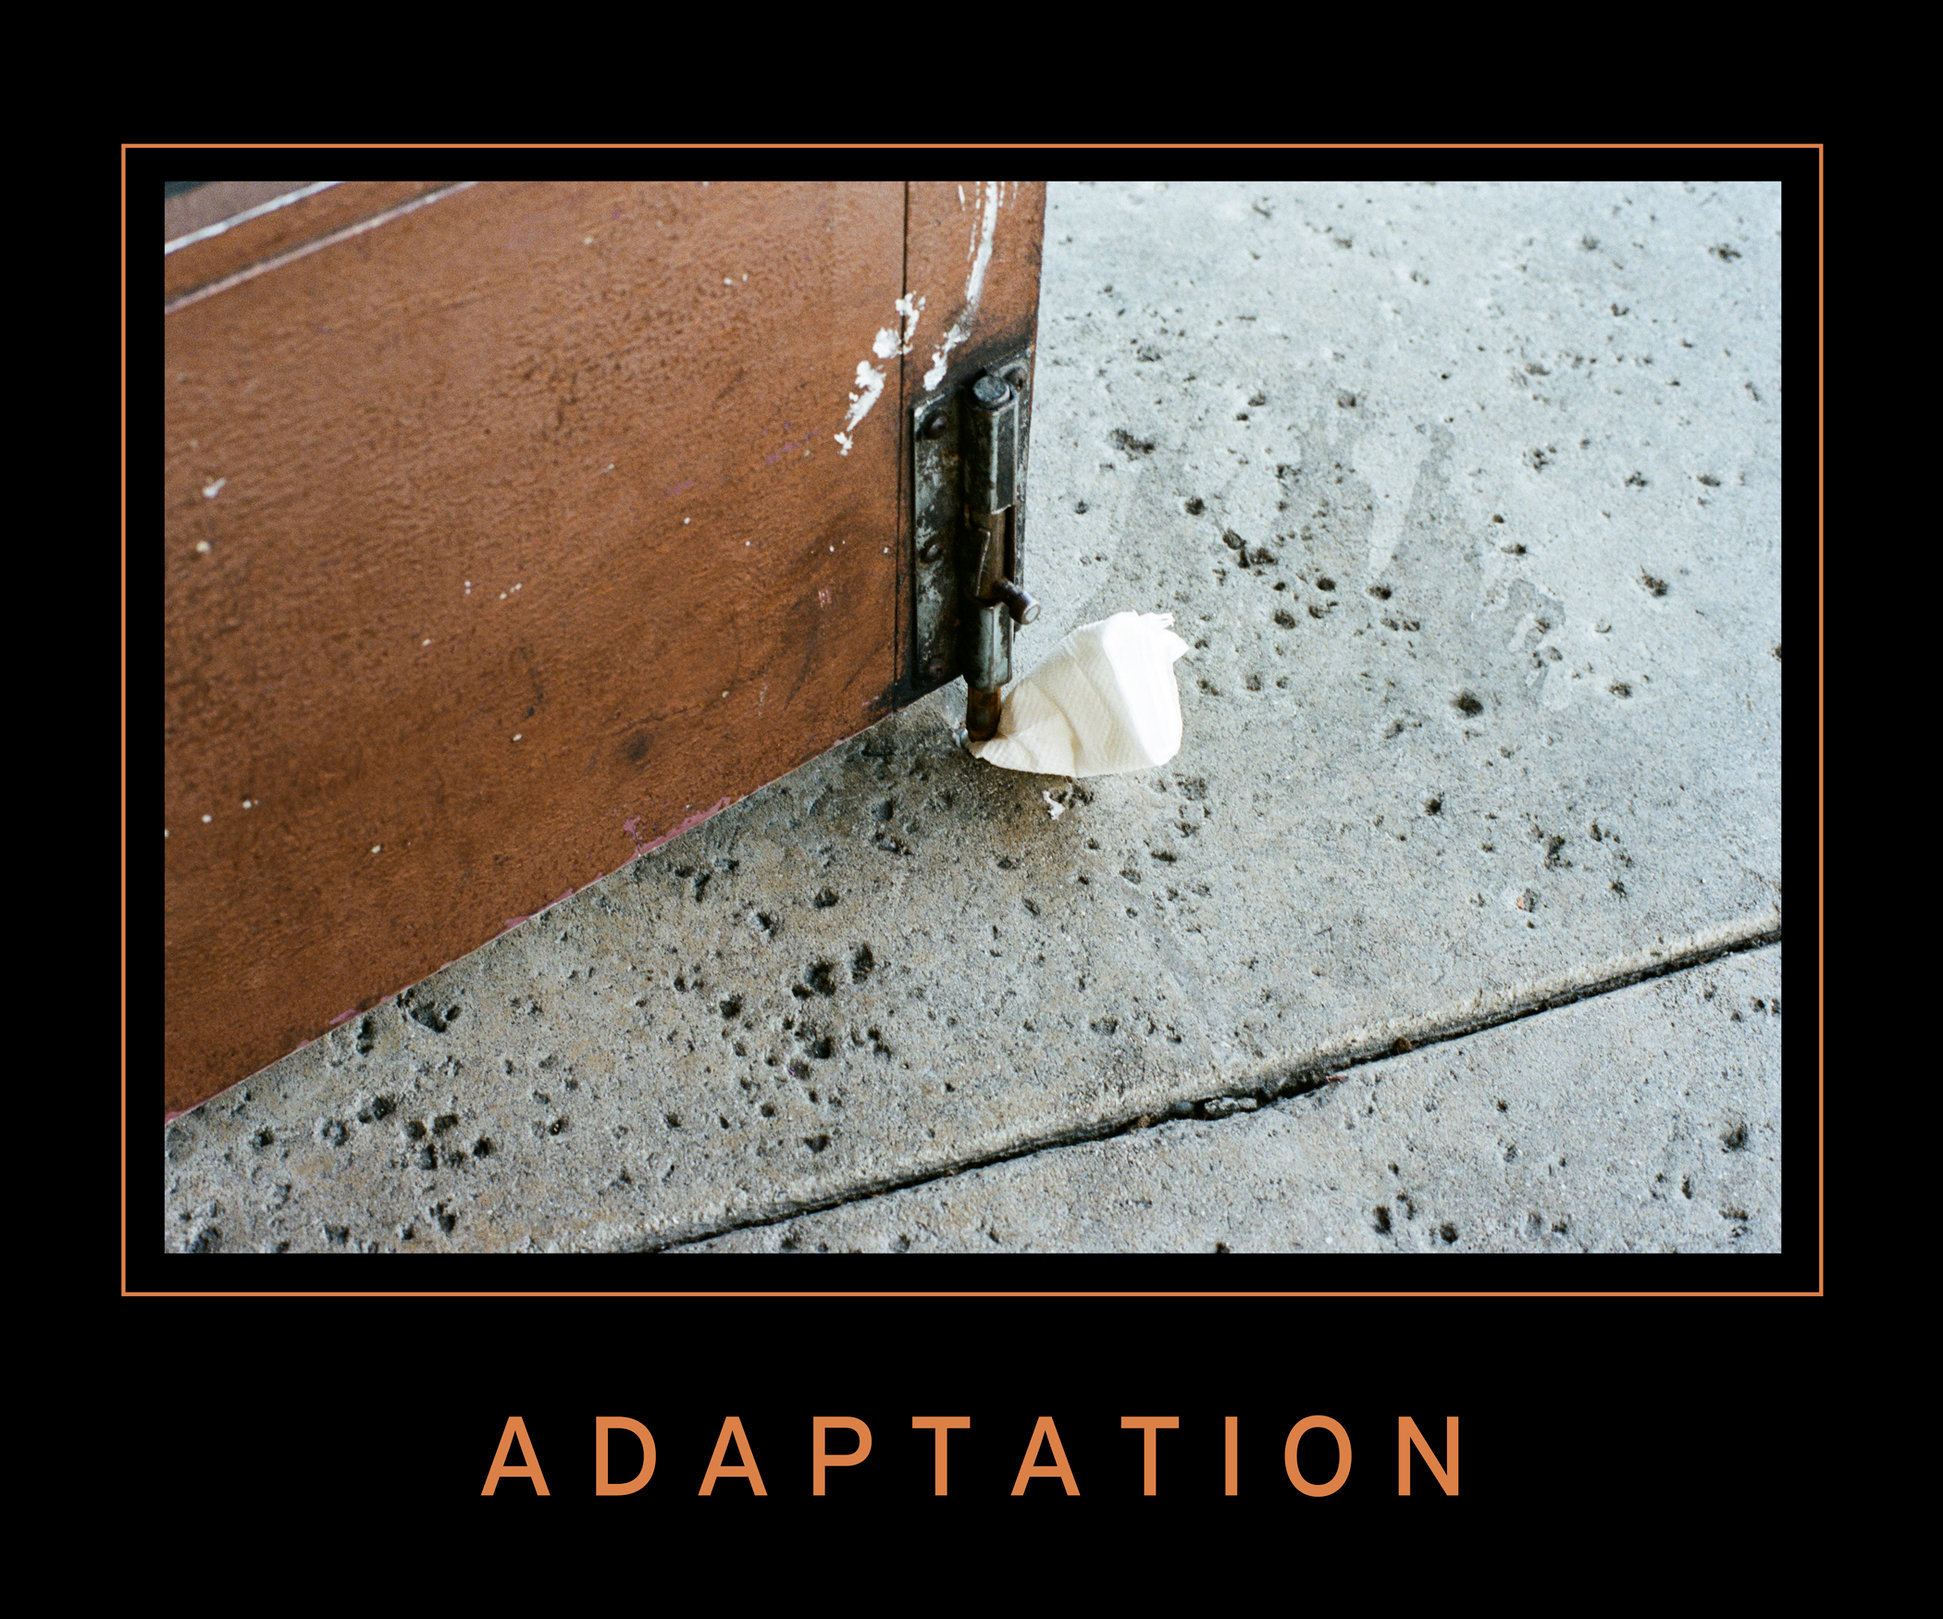 ADAPTATION_web.jpg